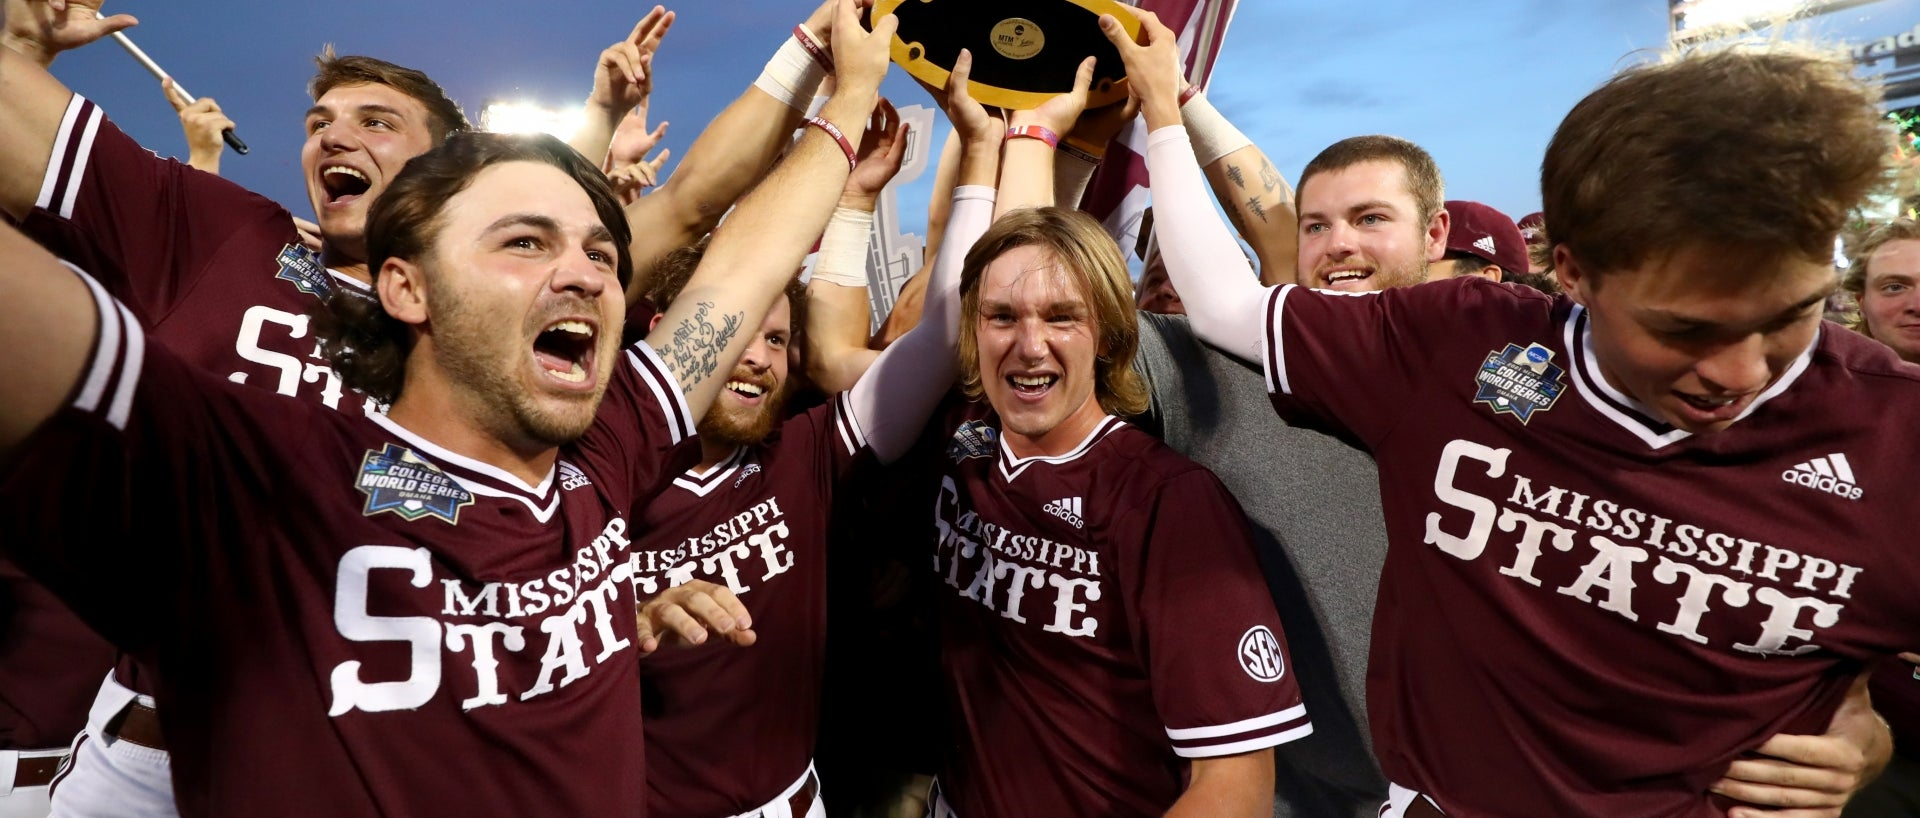 The Mississippi State Bulldogs celebrate their Division I Men's Baseball Championship win in Omaha, Nebraska.